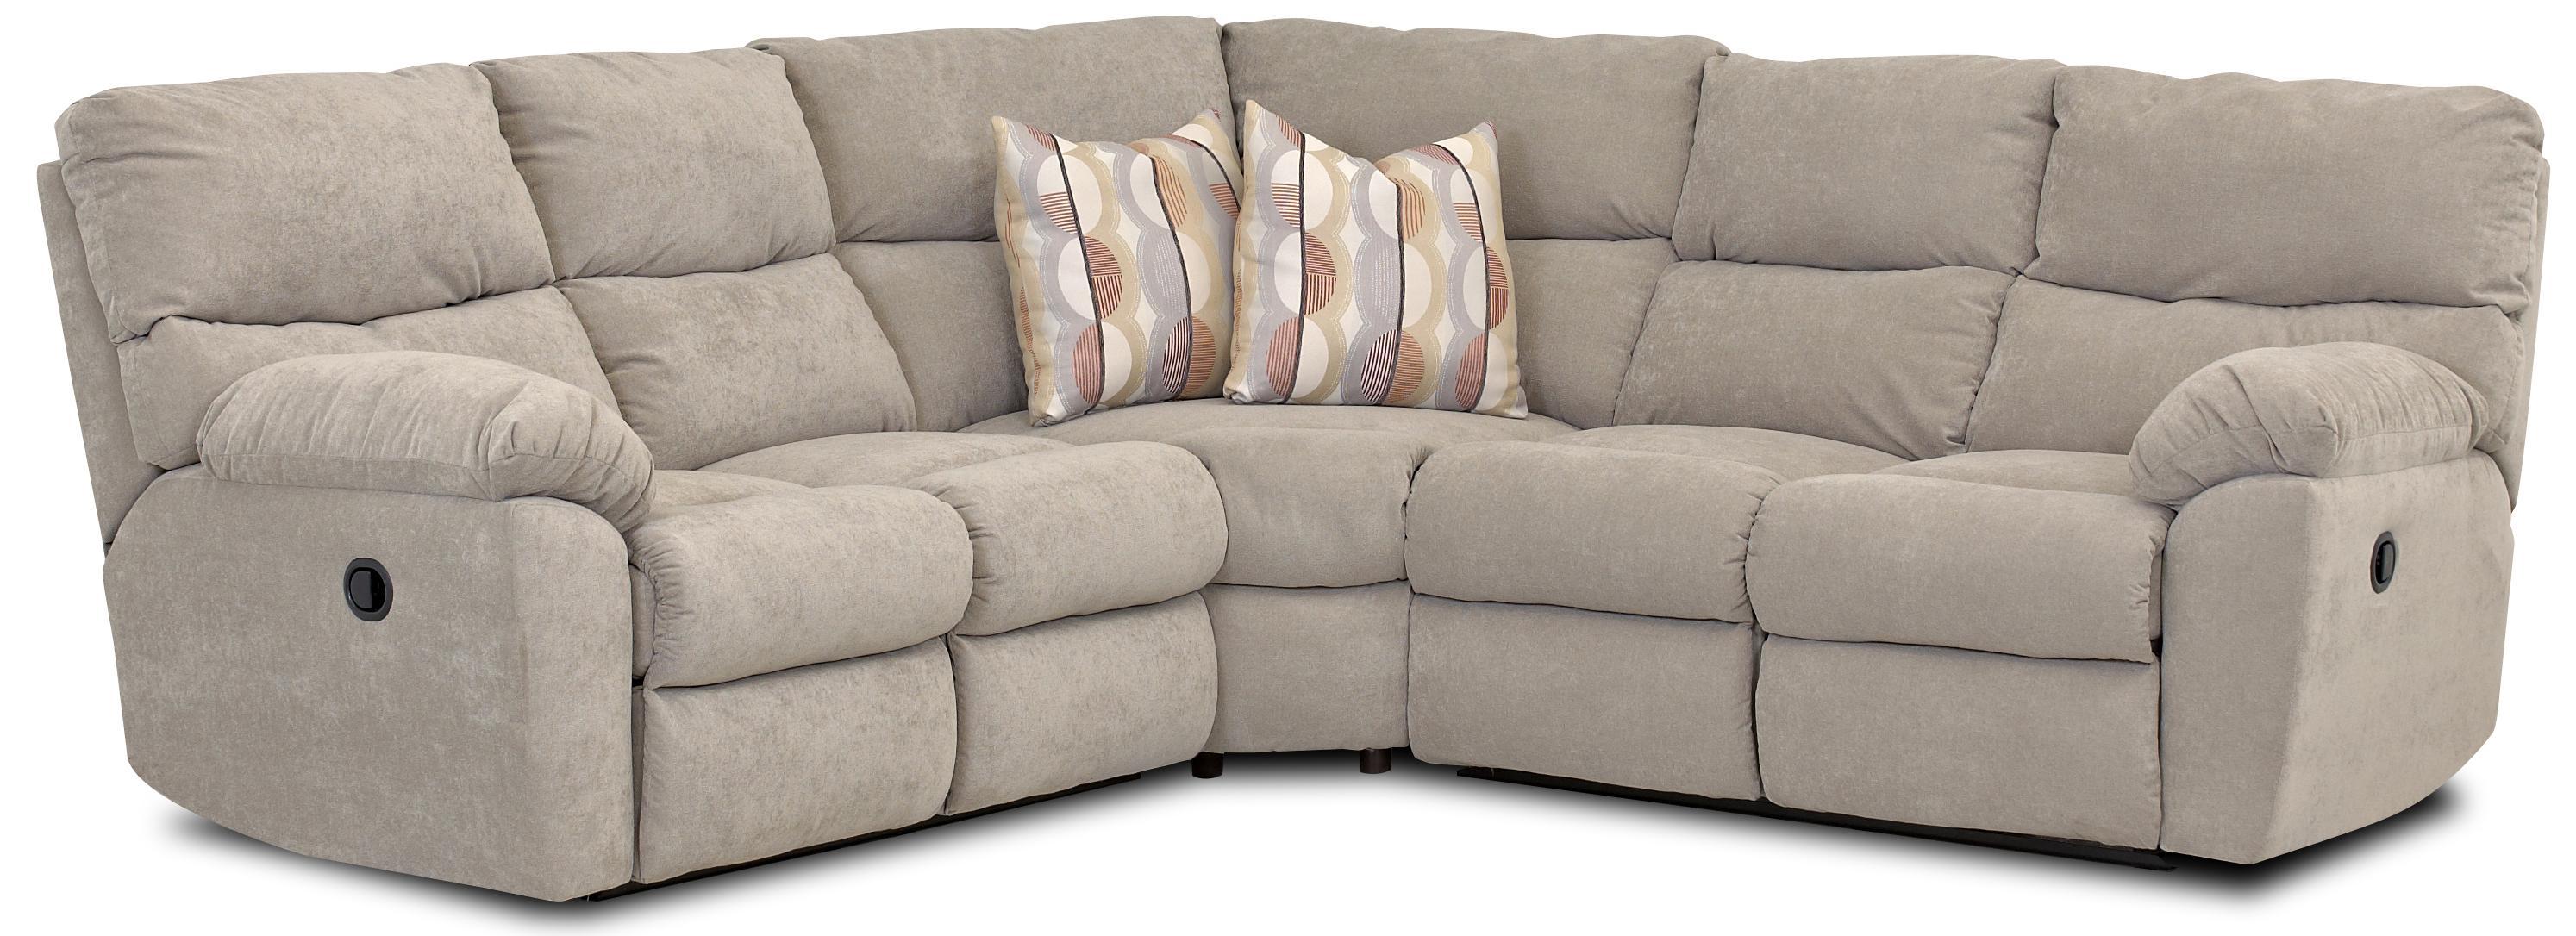 awesome power reclining sectional sofa new tatsuyoru